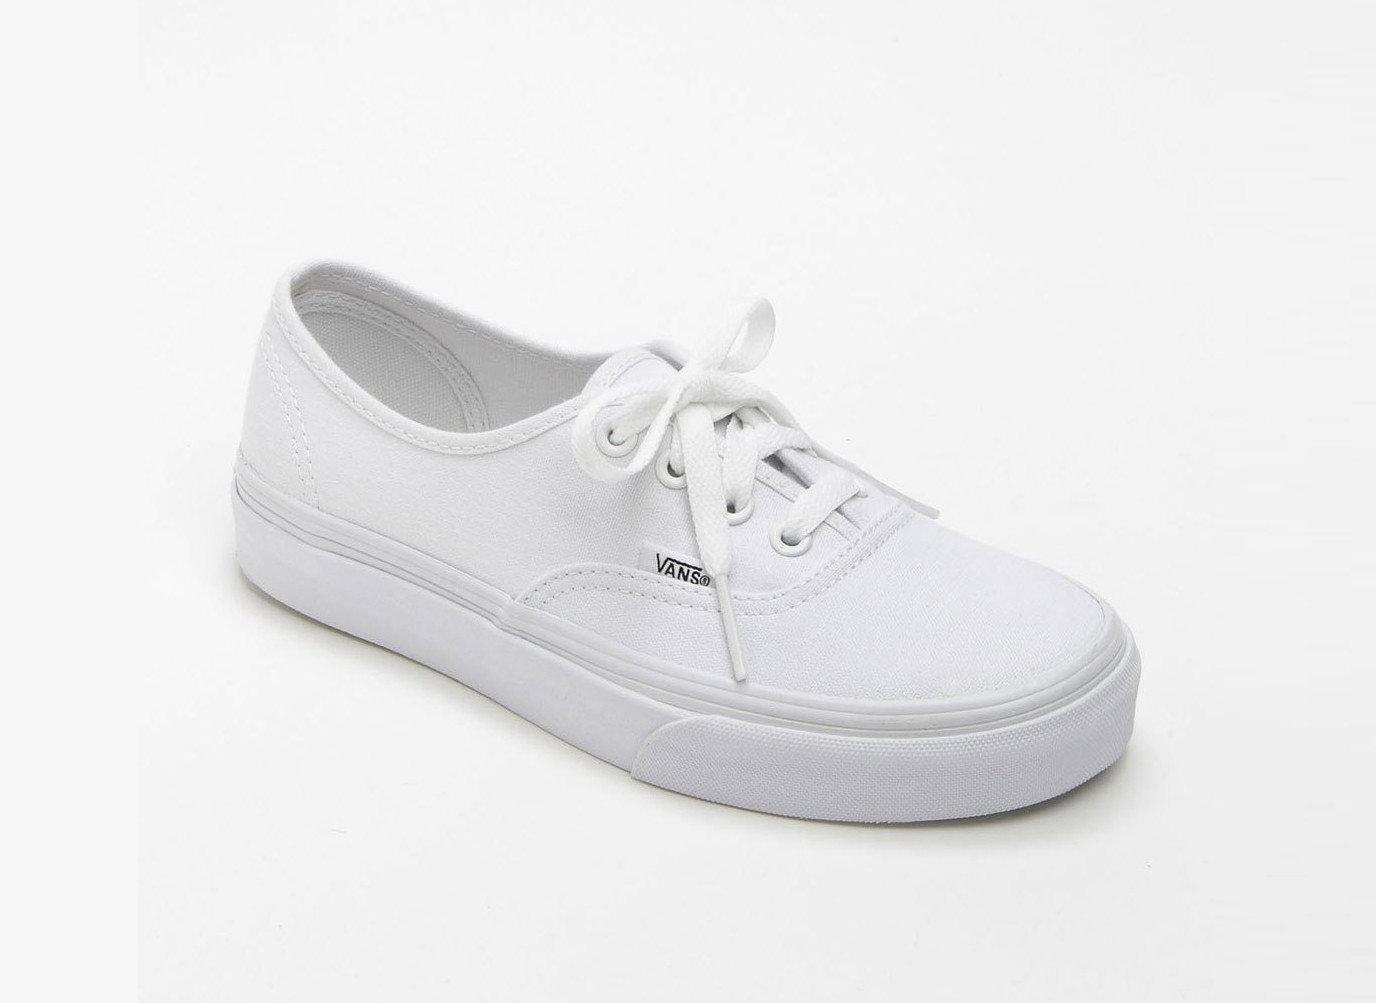 Packing Tips Style + Design Travel Shop footwear clothing white shoe walking shoe product sneakers product design outdoor shoe brand skate shoe feet